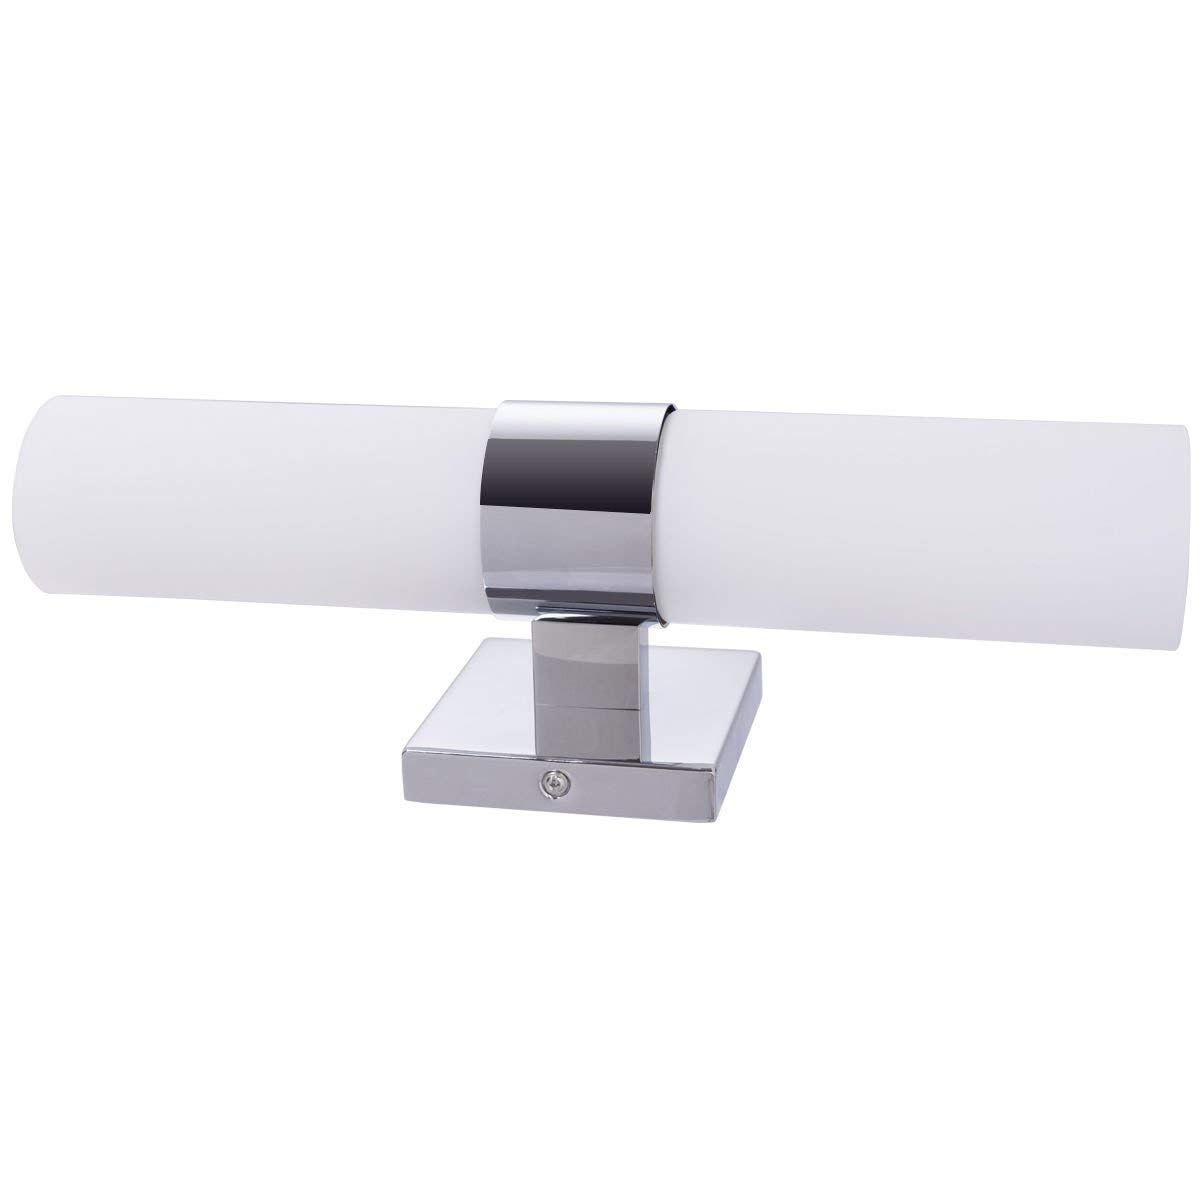 e5bb8e0f282c3 Tangkula Bath Light 2-Led Polished Chrome Vanity Fixture Bathroom ...